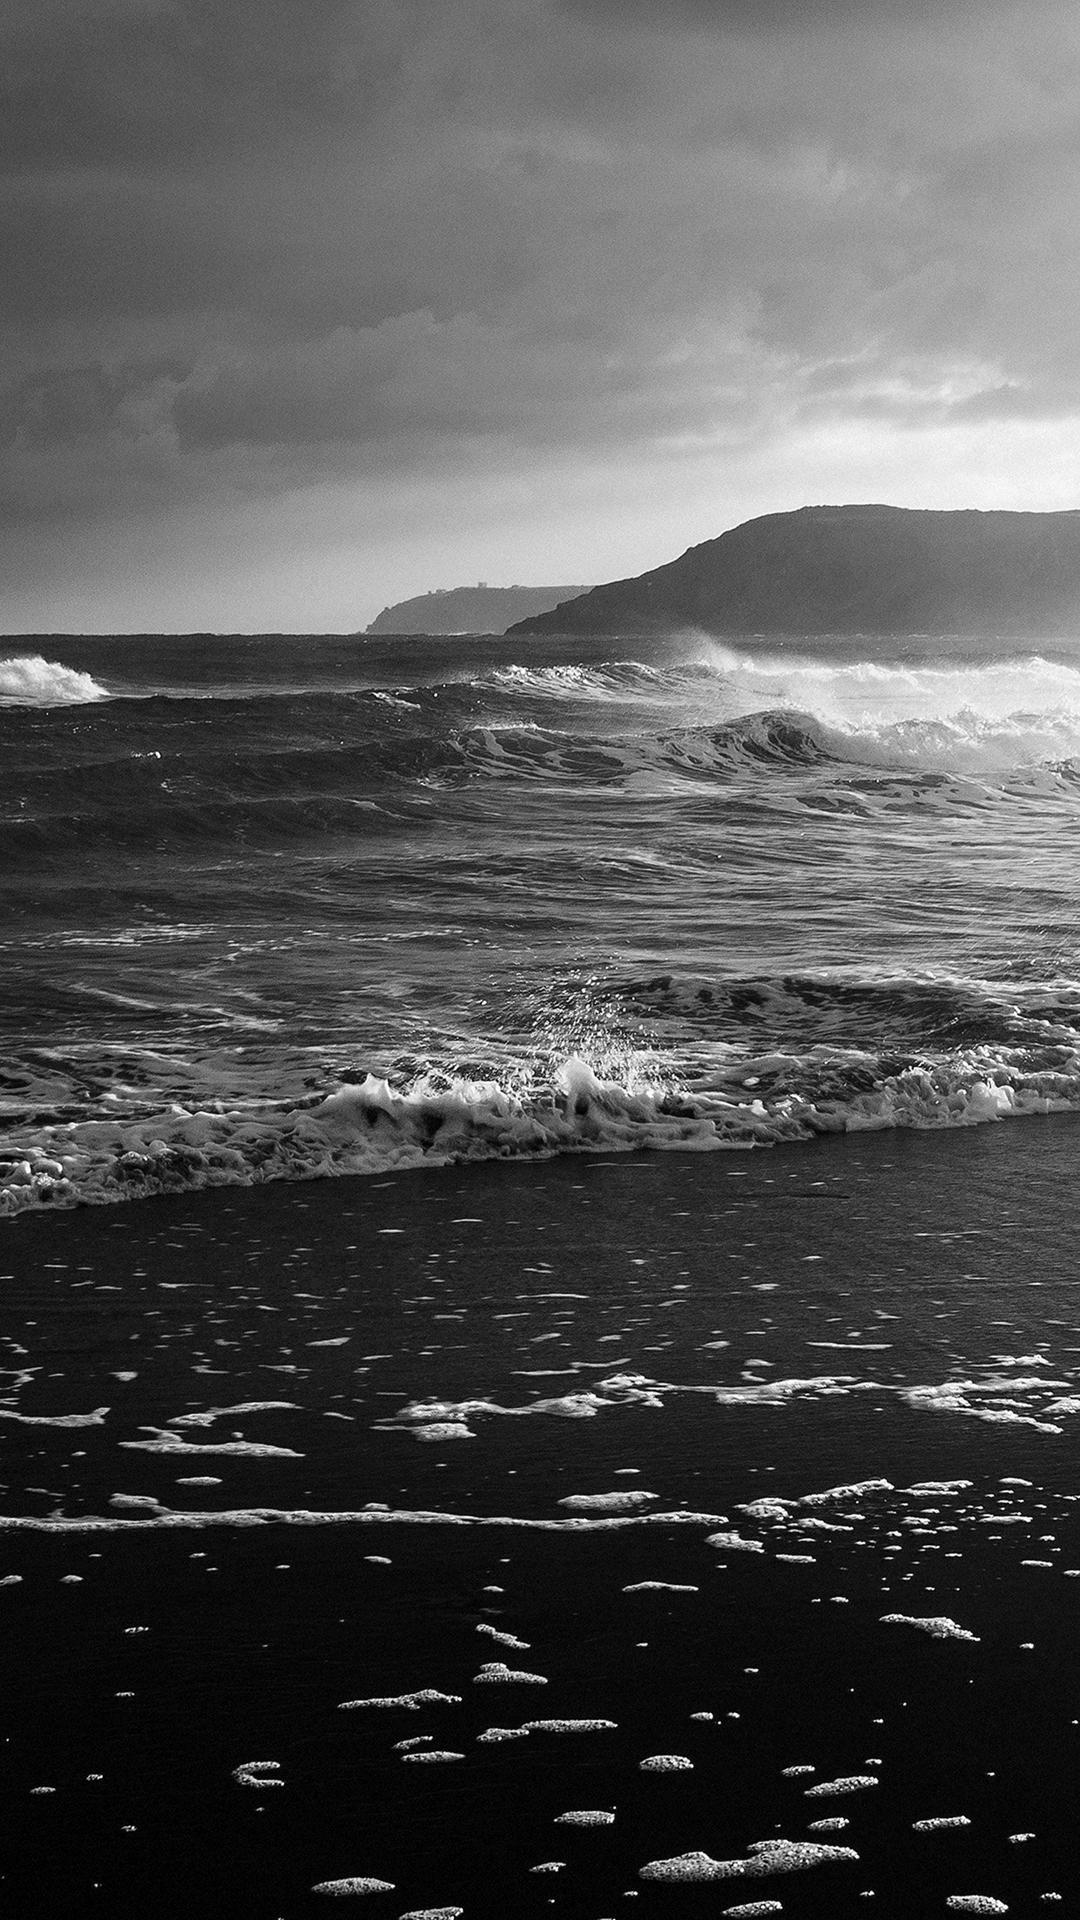 wallpaper.wiki-Beach-Costal-Nature-Sea-Water-Summer-